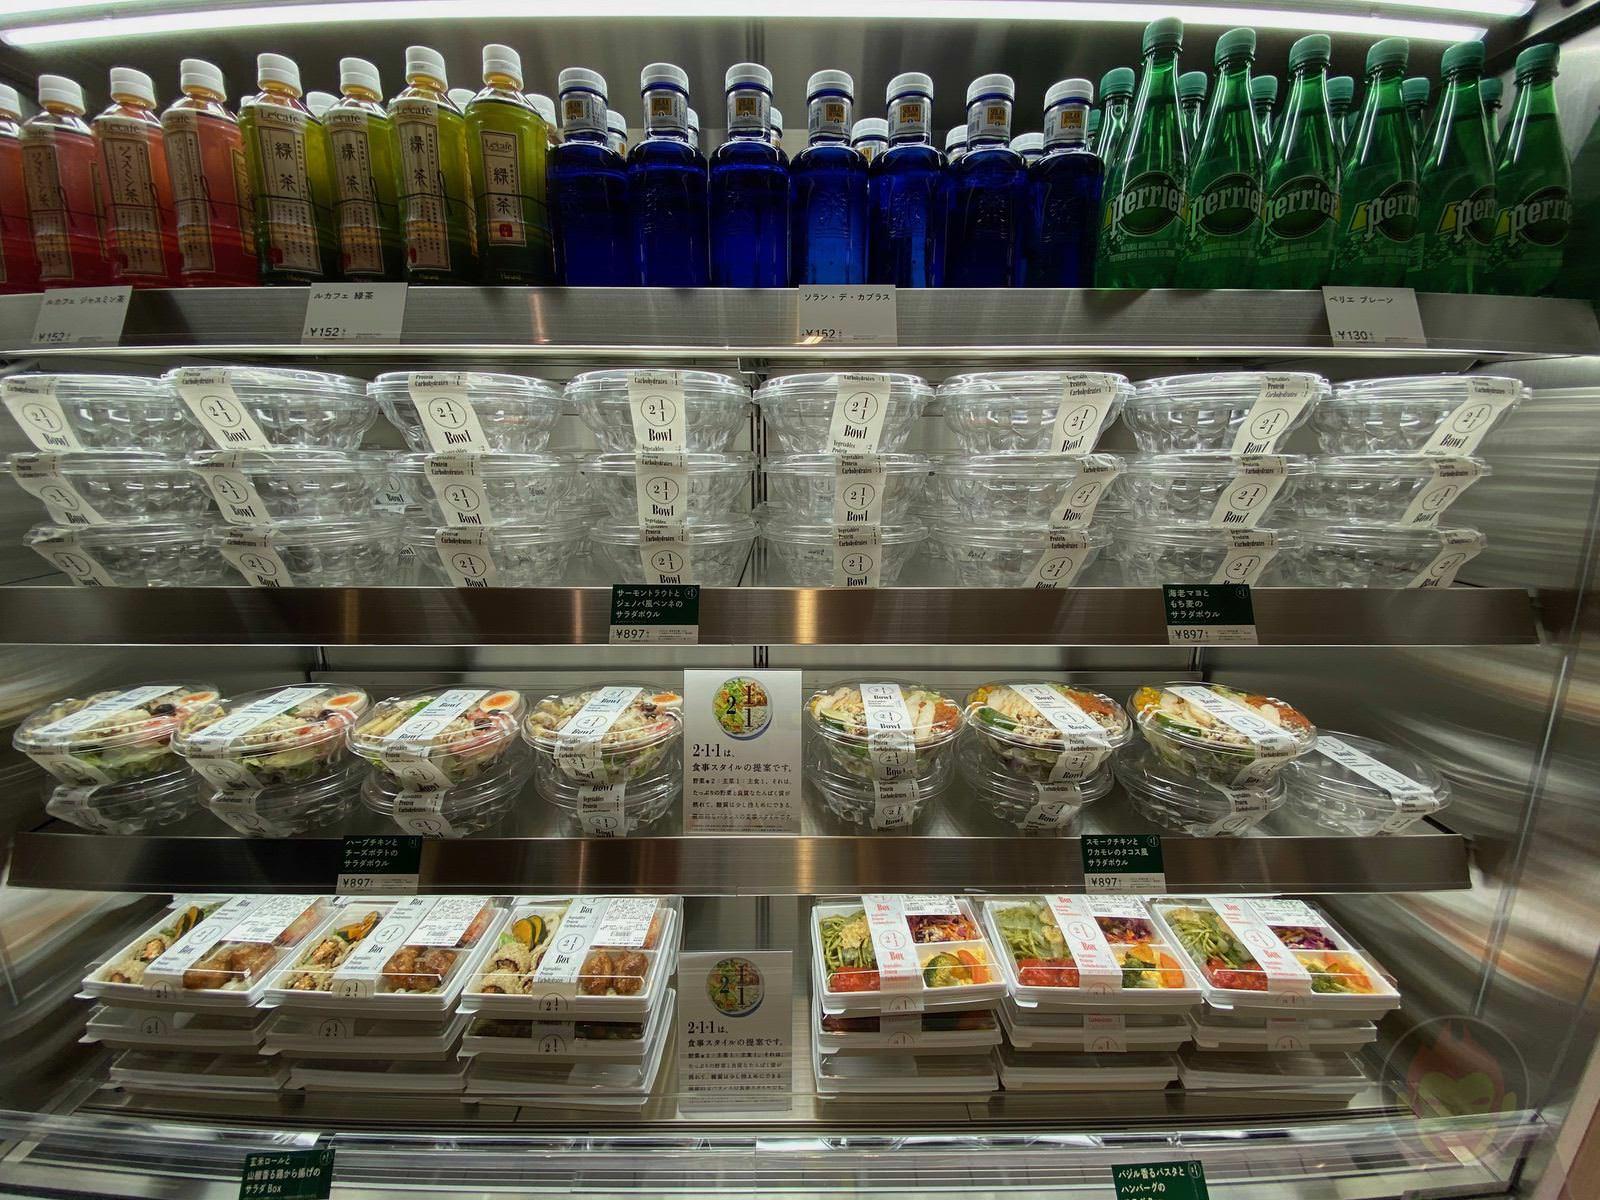 Shibuya-Scramble-Square-Food-I-Ate-133.jpeg